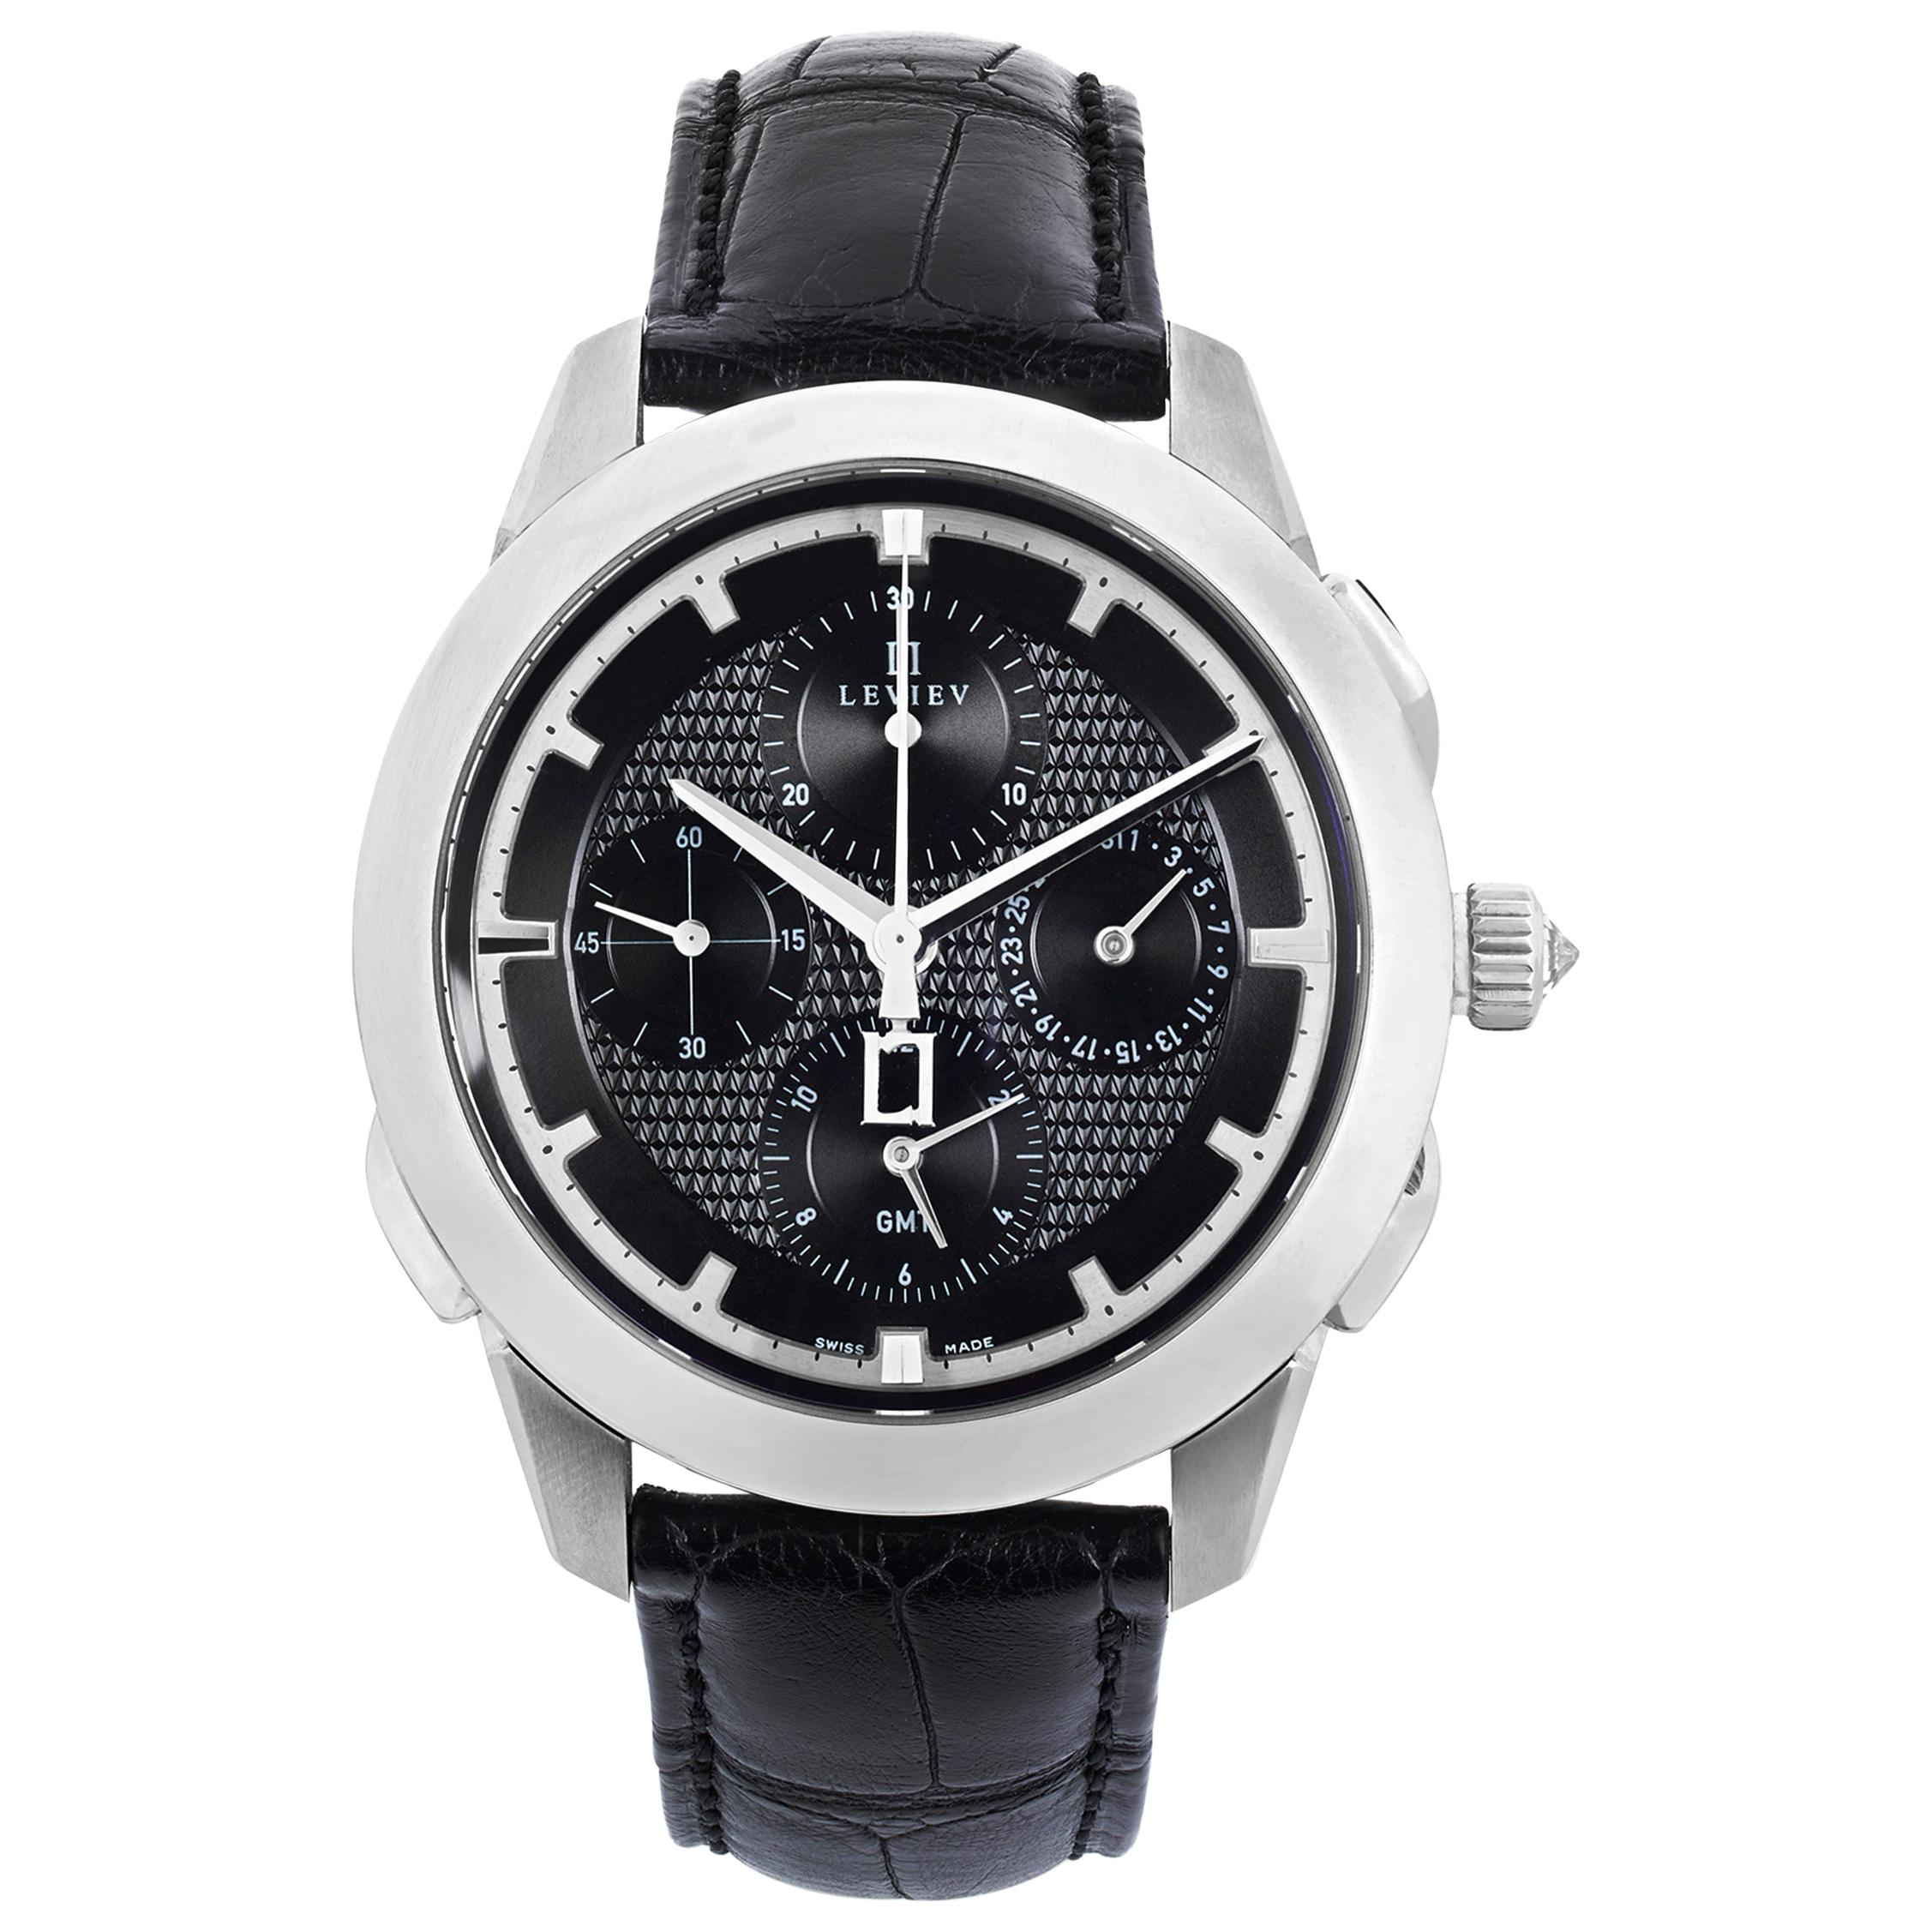 Chronograph Self-Winding Wristwatch